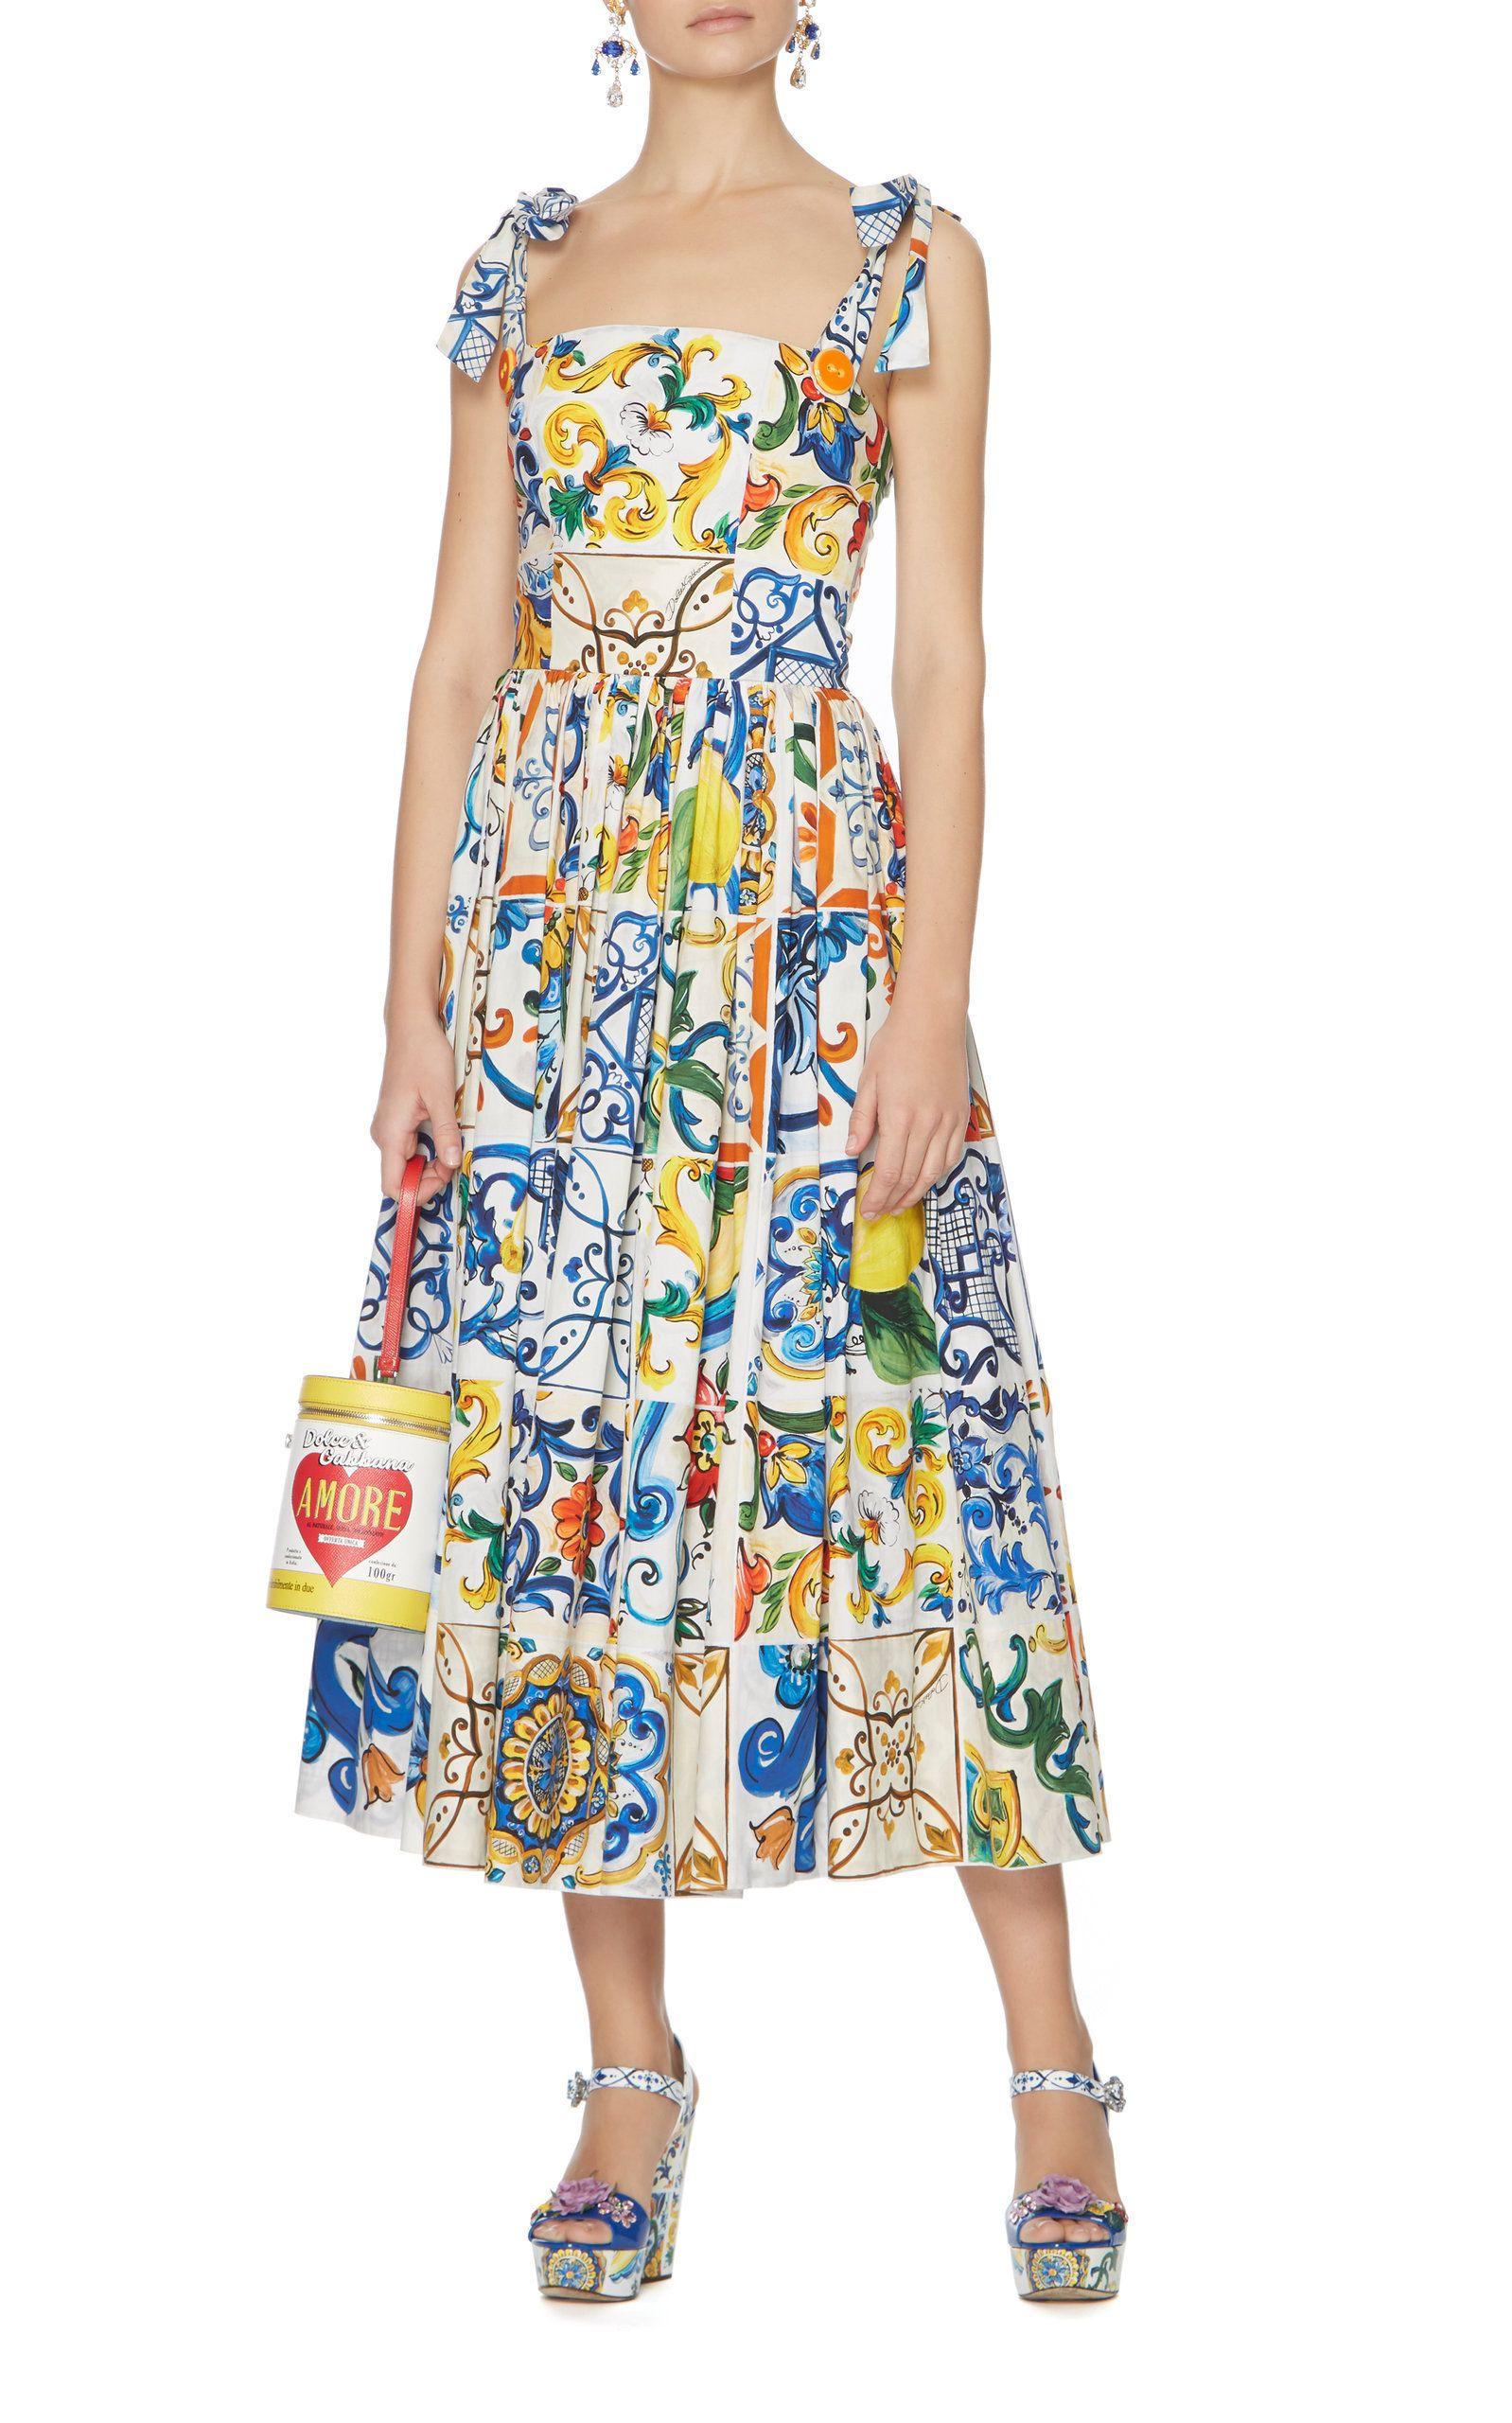 dolce and gabbana dress,dolce and gabbana dress,